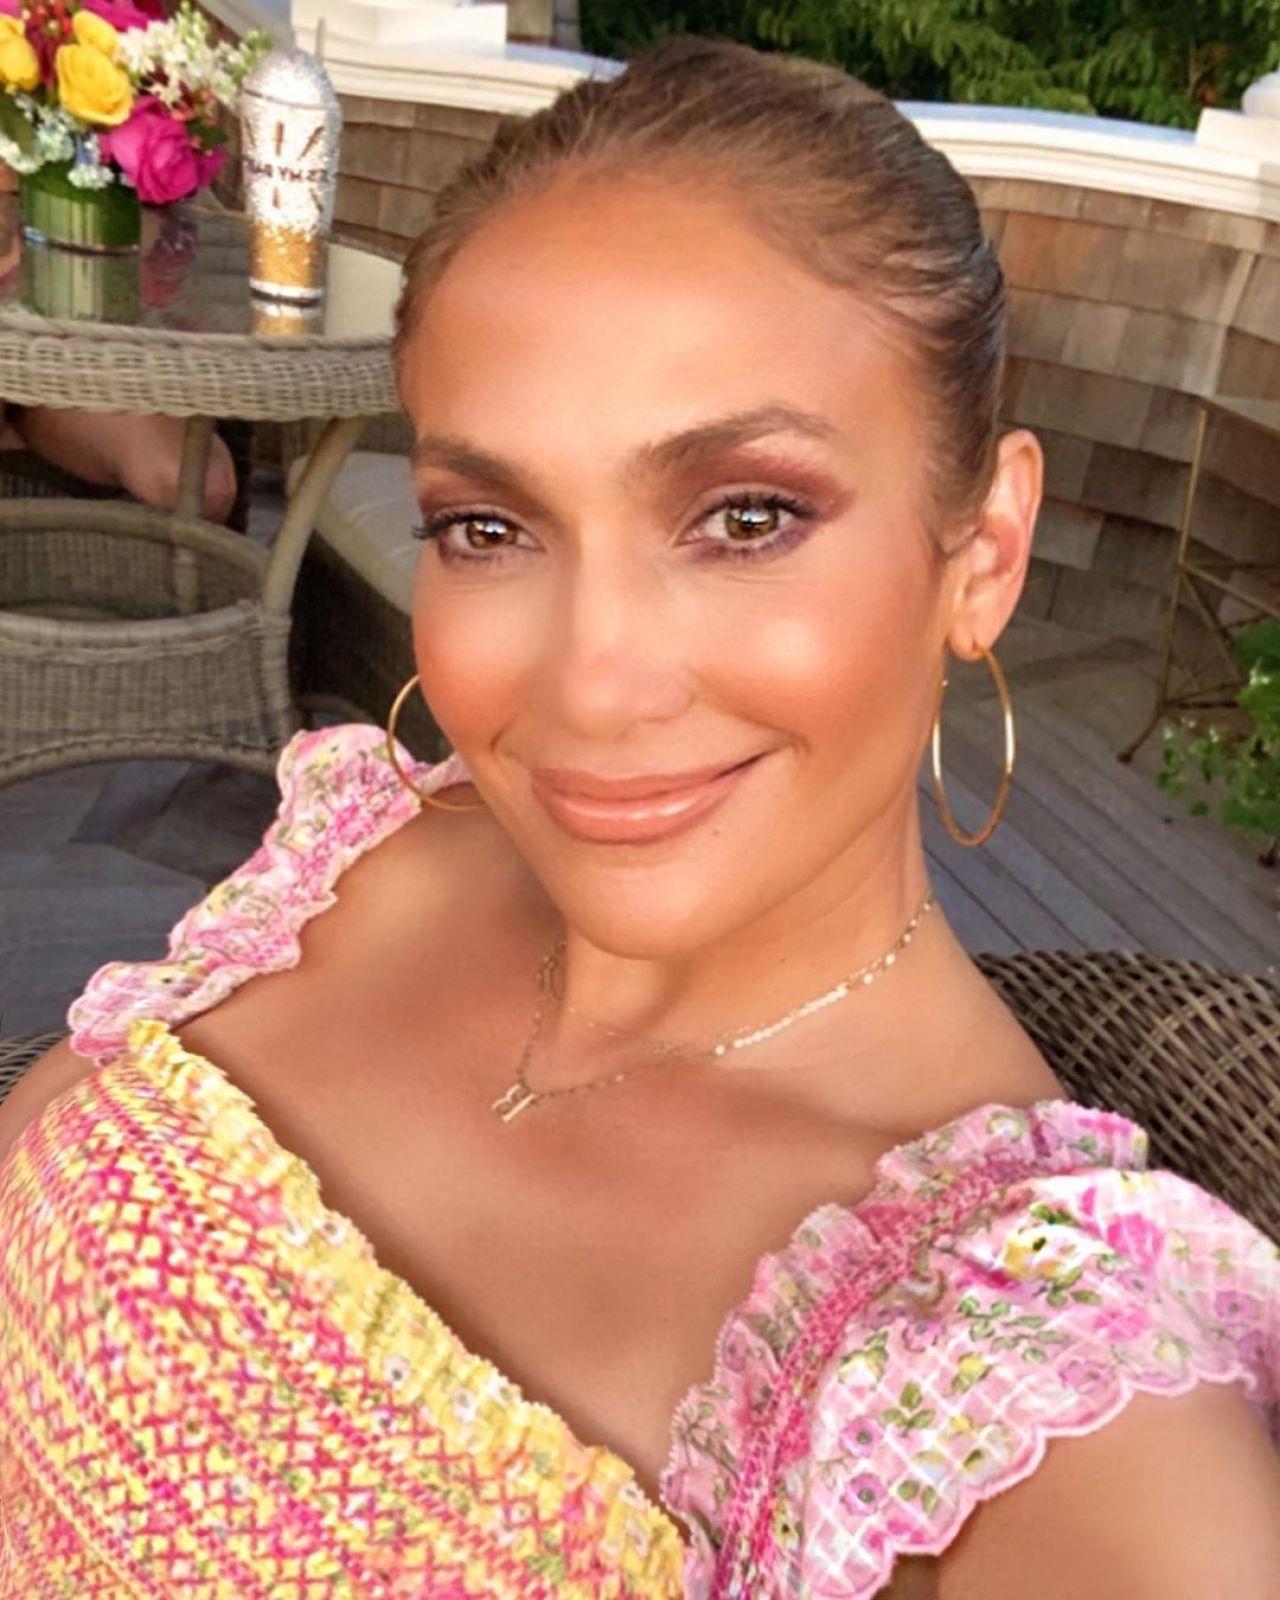 Jennifer Lopezs Sexiest Instagram Photos